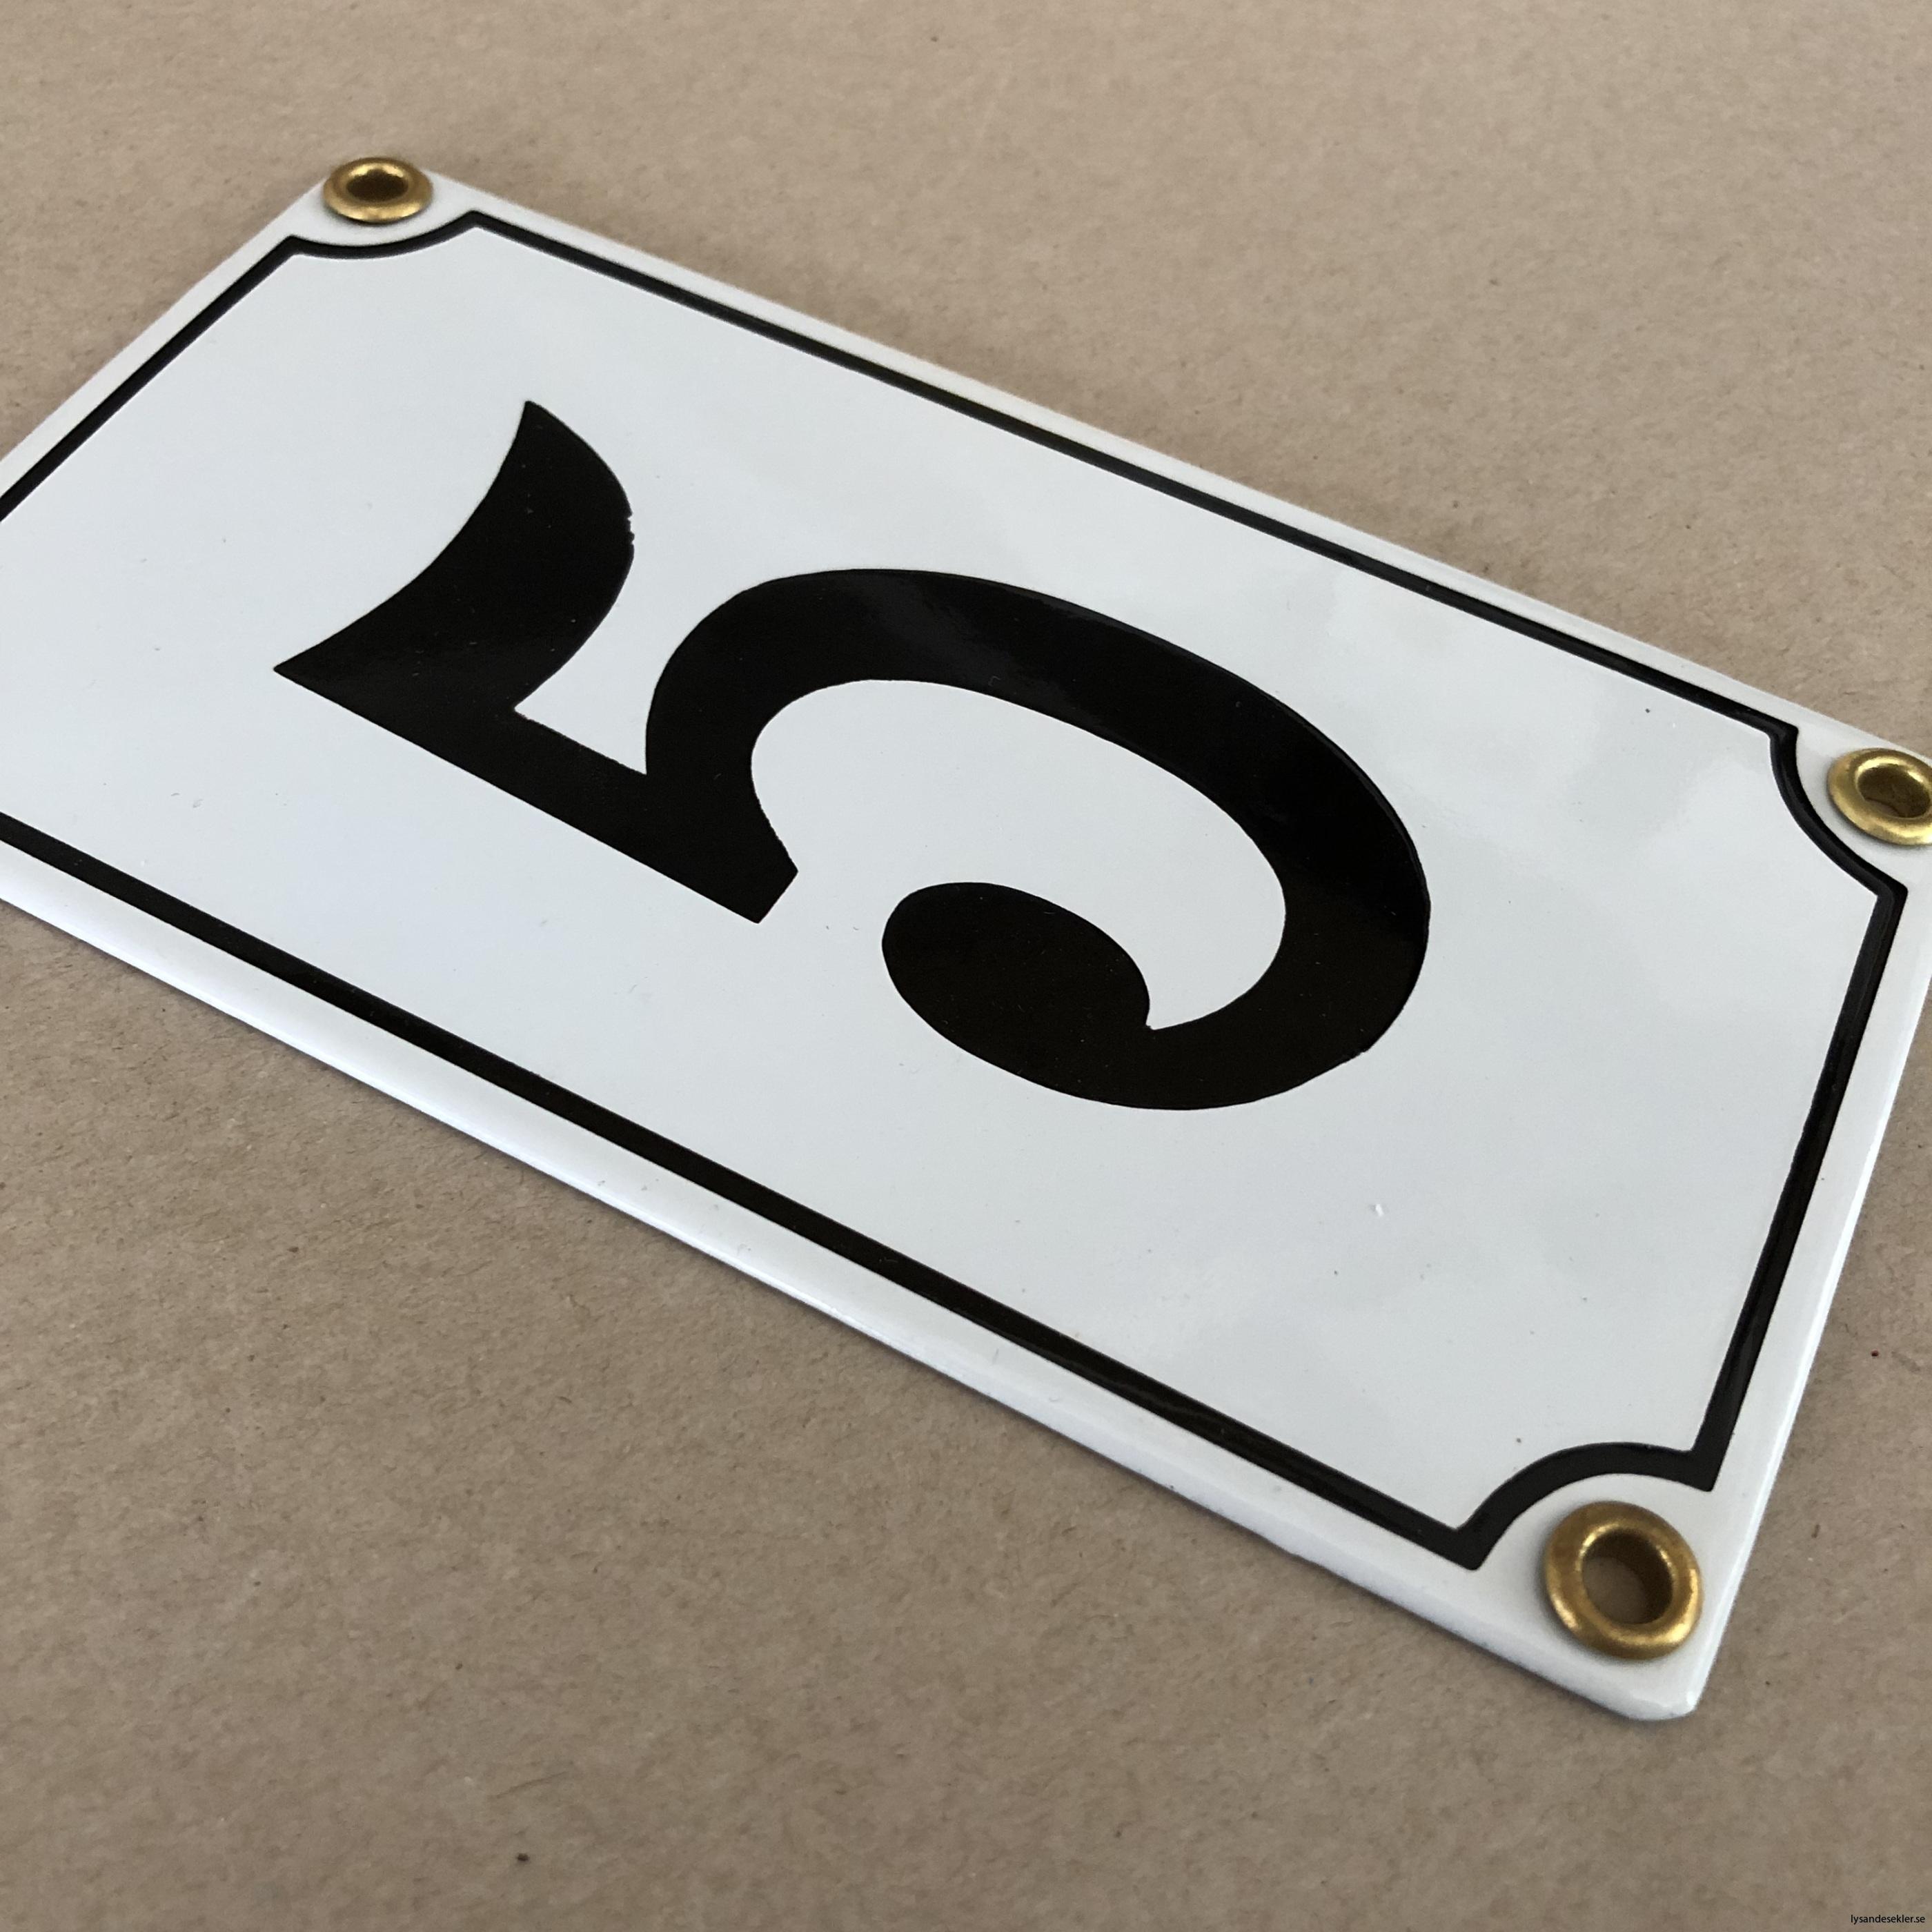 emaljsiffra siffra i emalj fasadsiffra nummer9